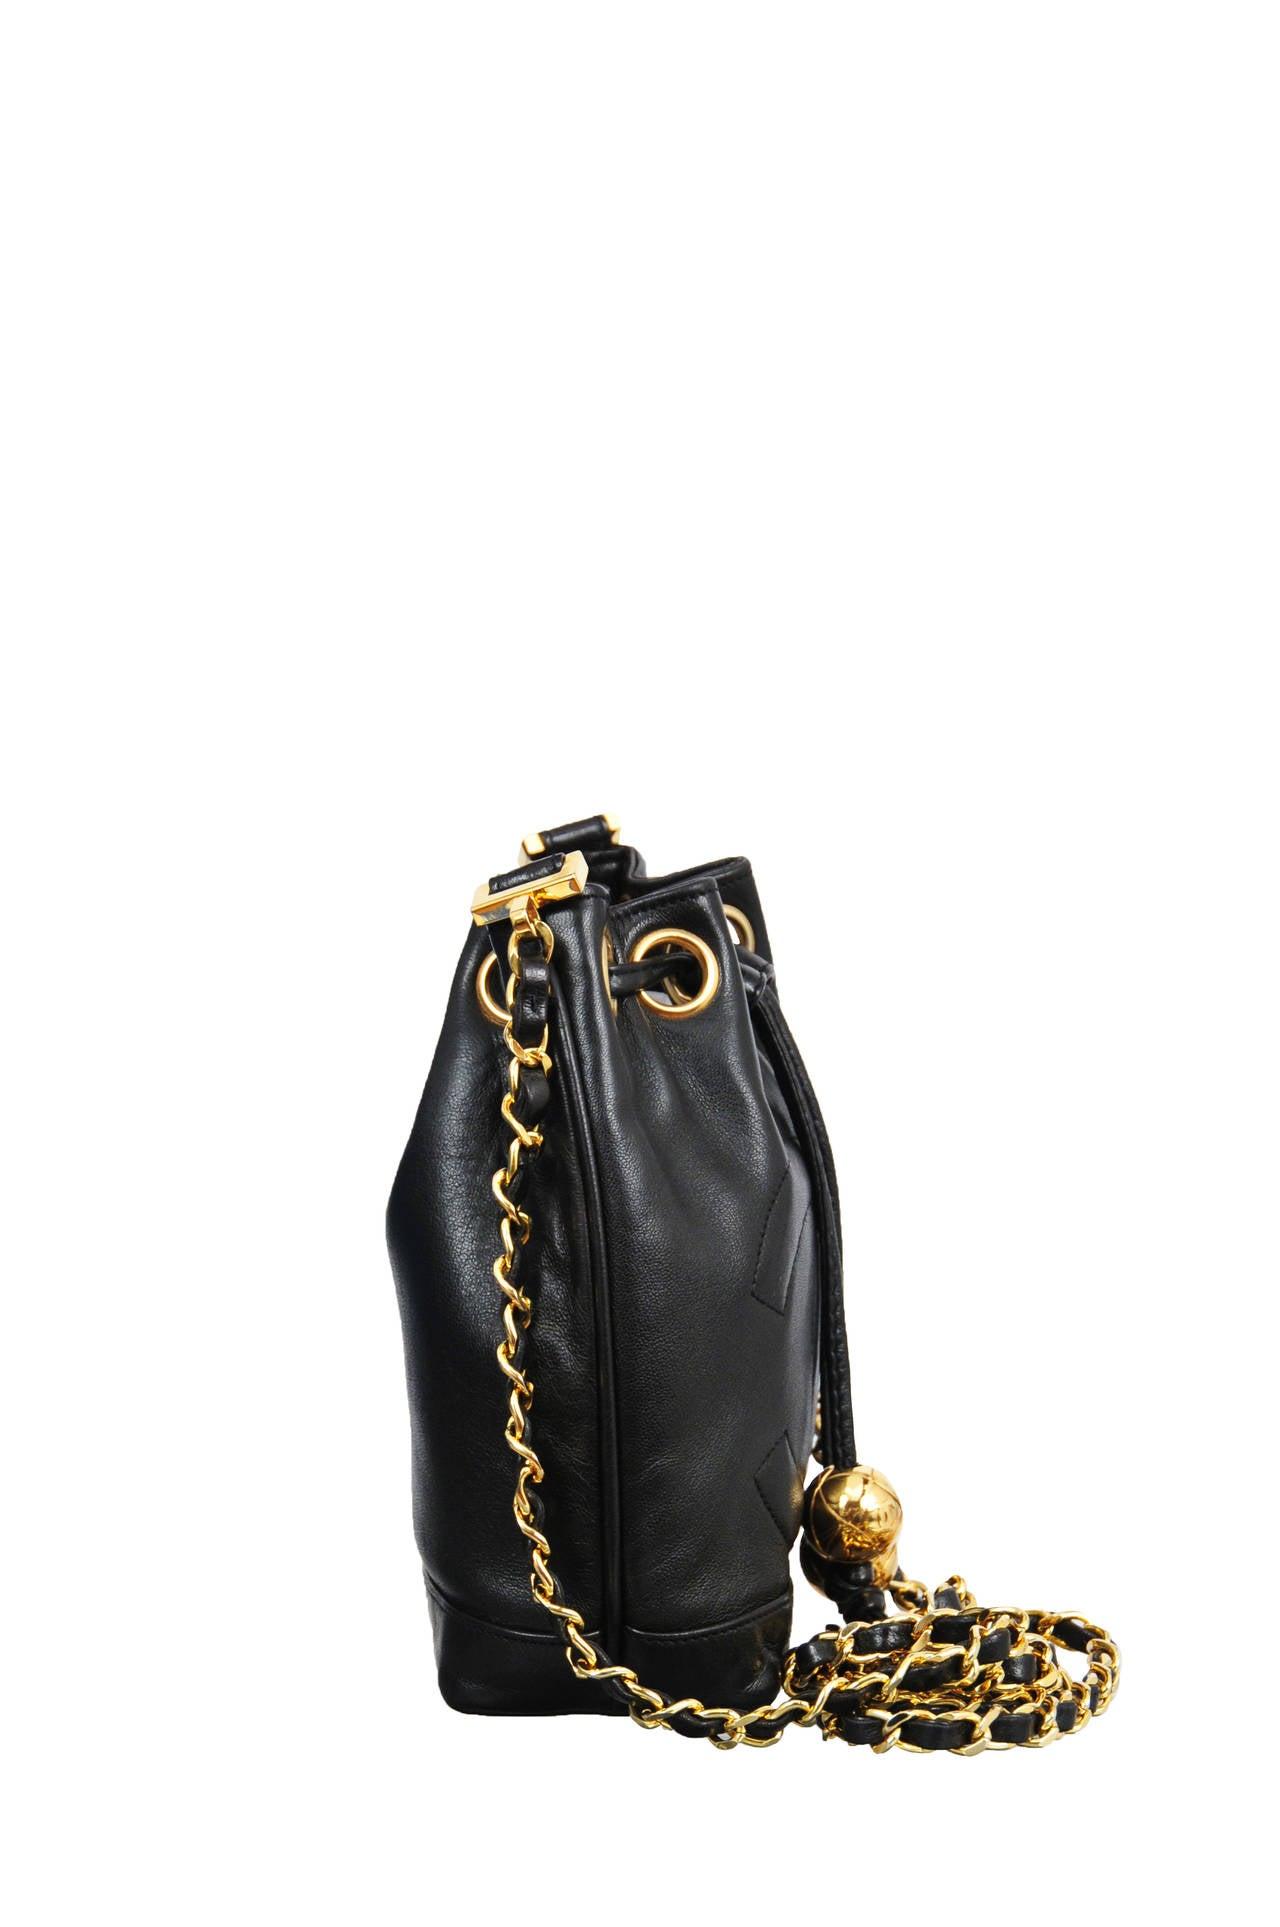 Chanel Black Lambskin Mini Bucket Bag At 1stdibs